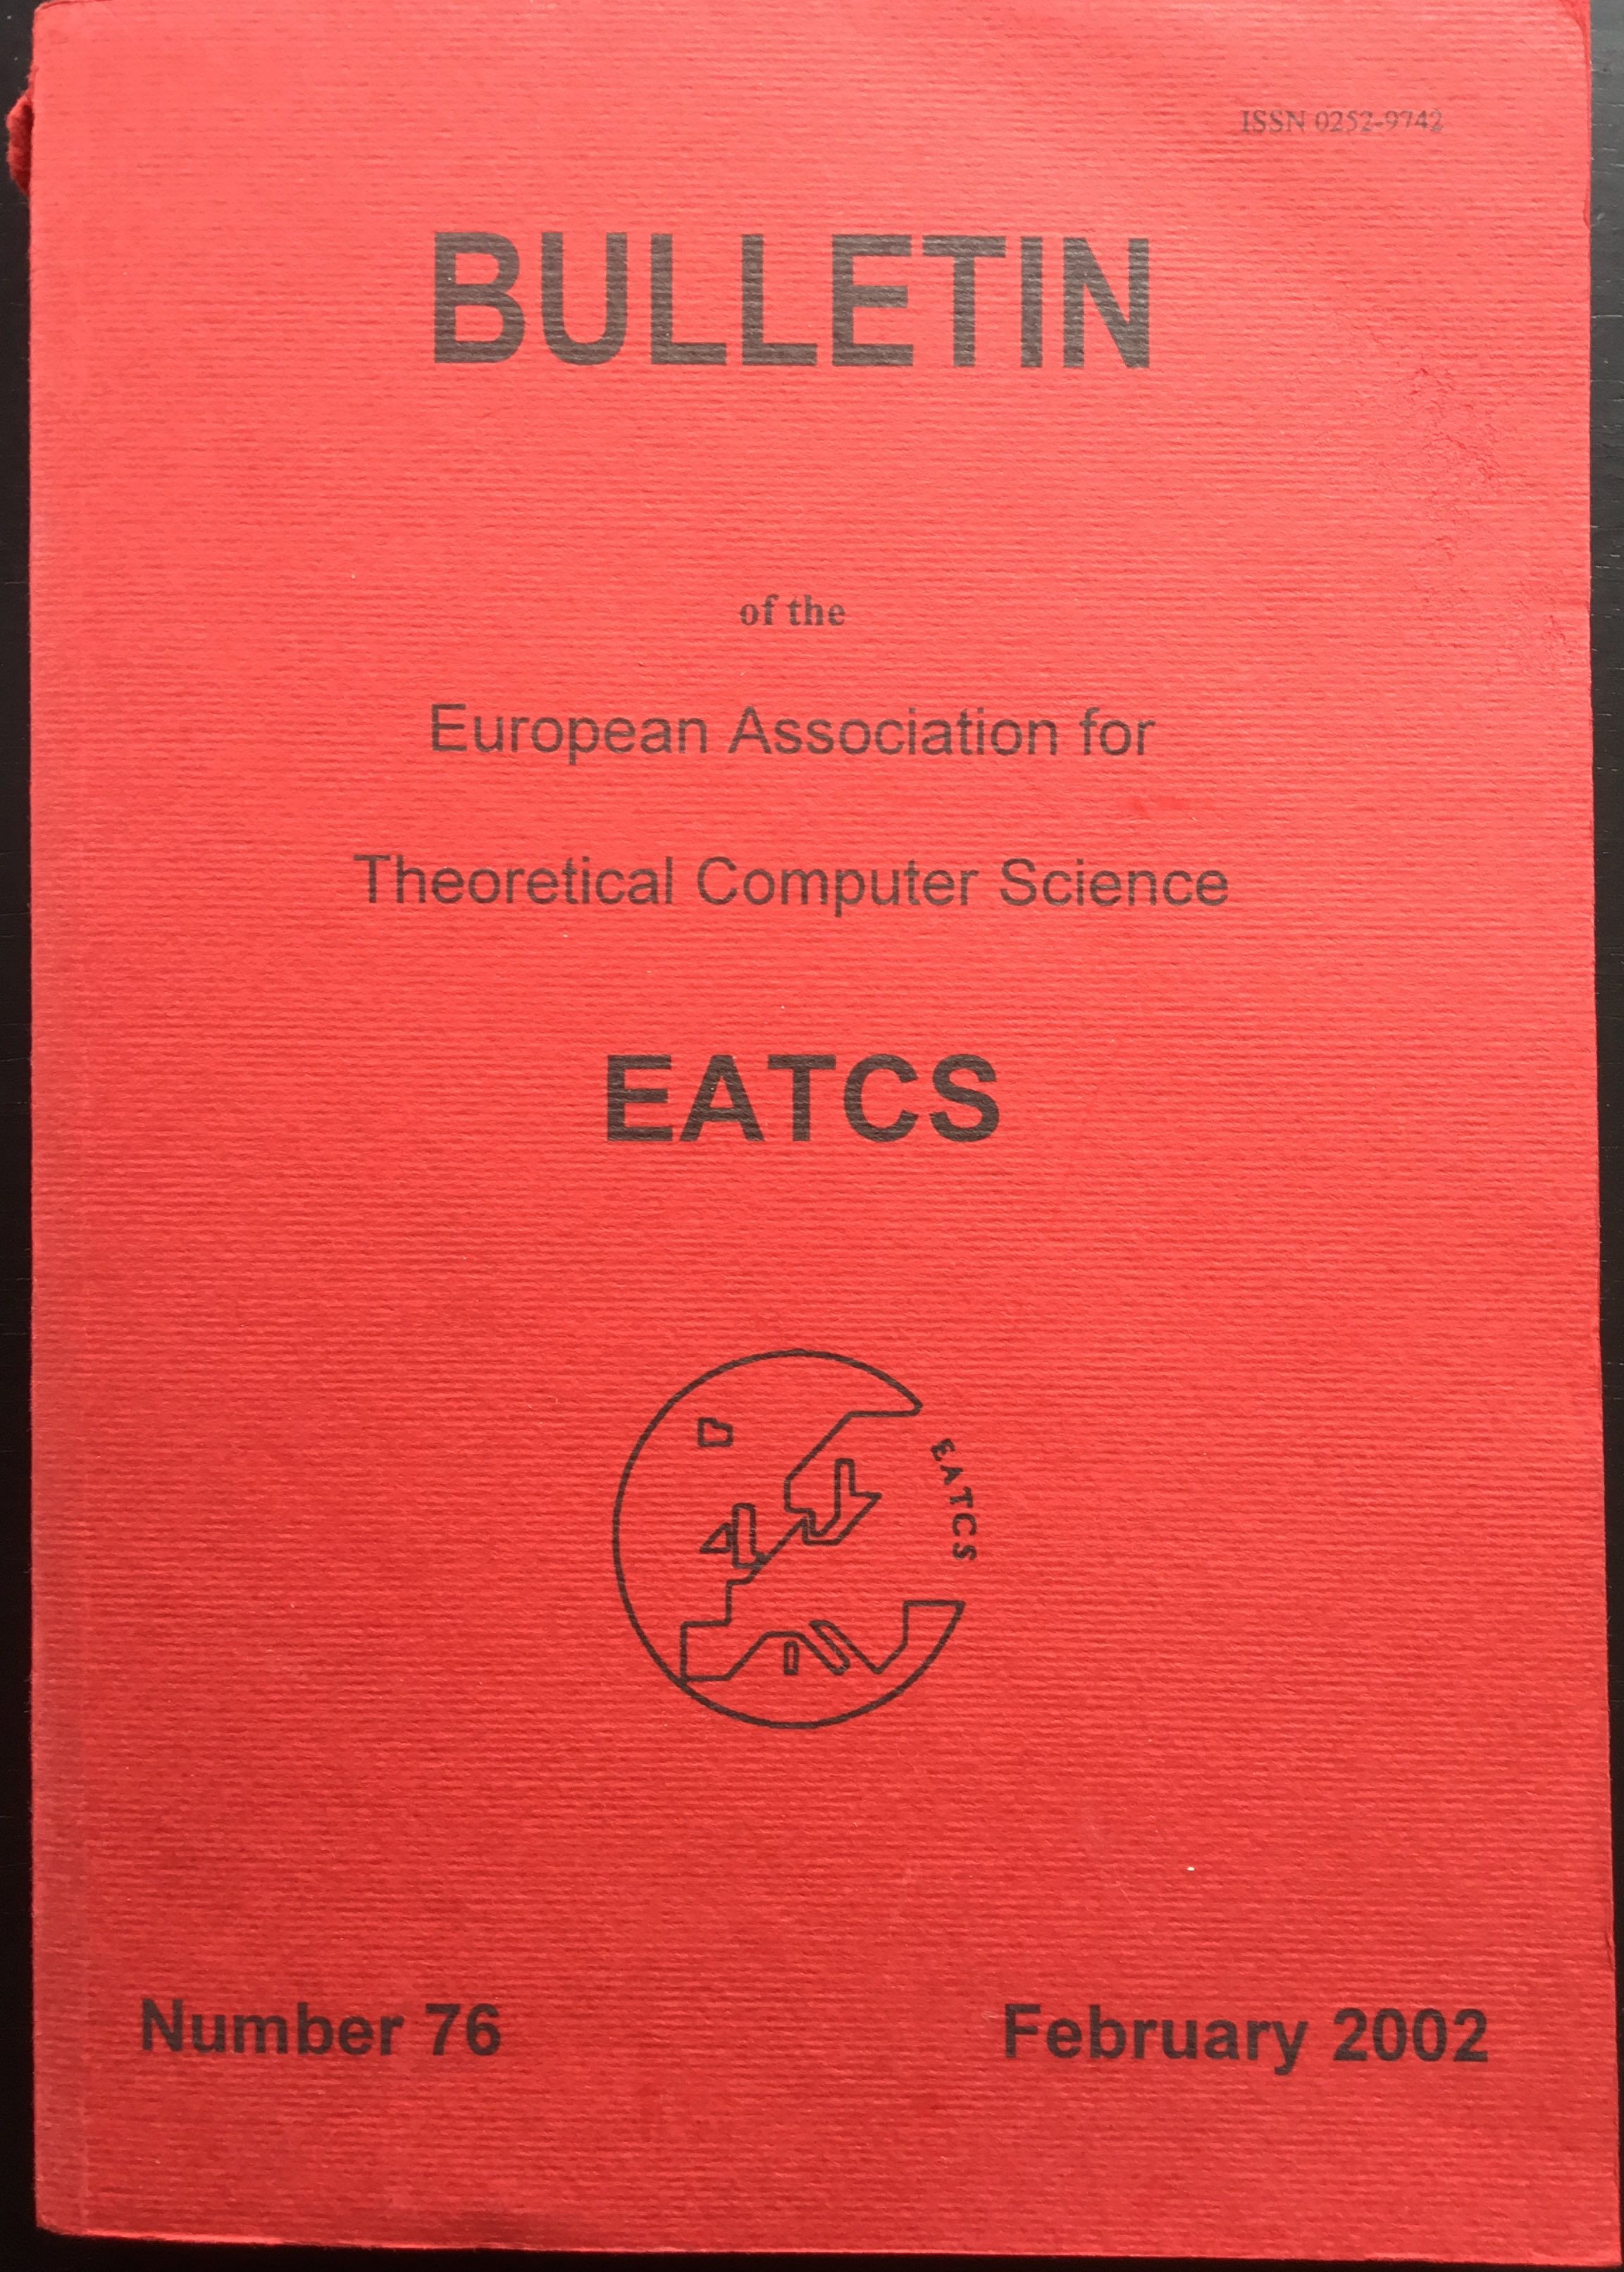 eatcs-2002